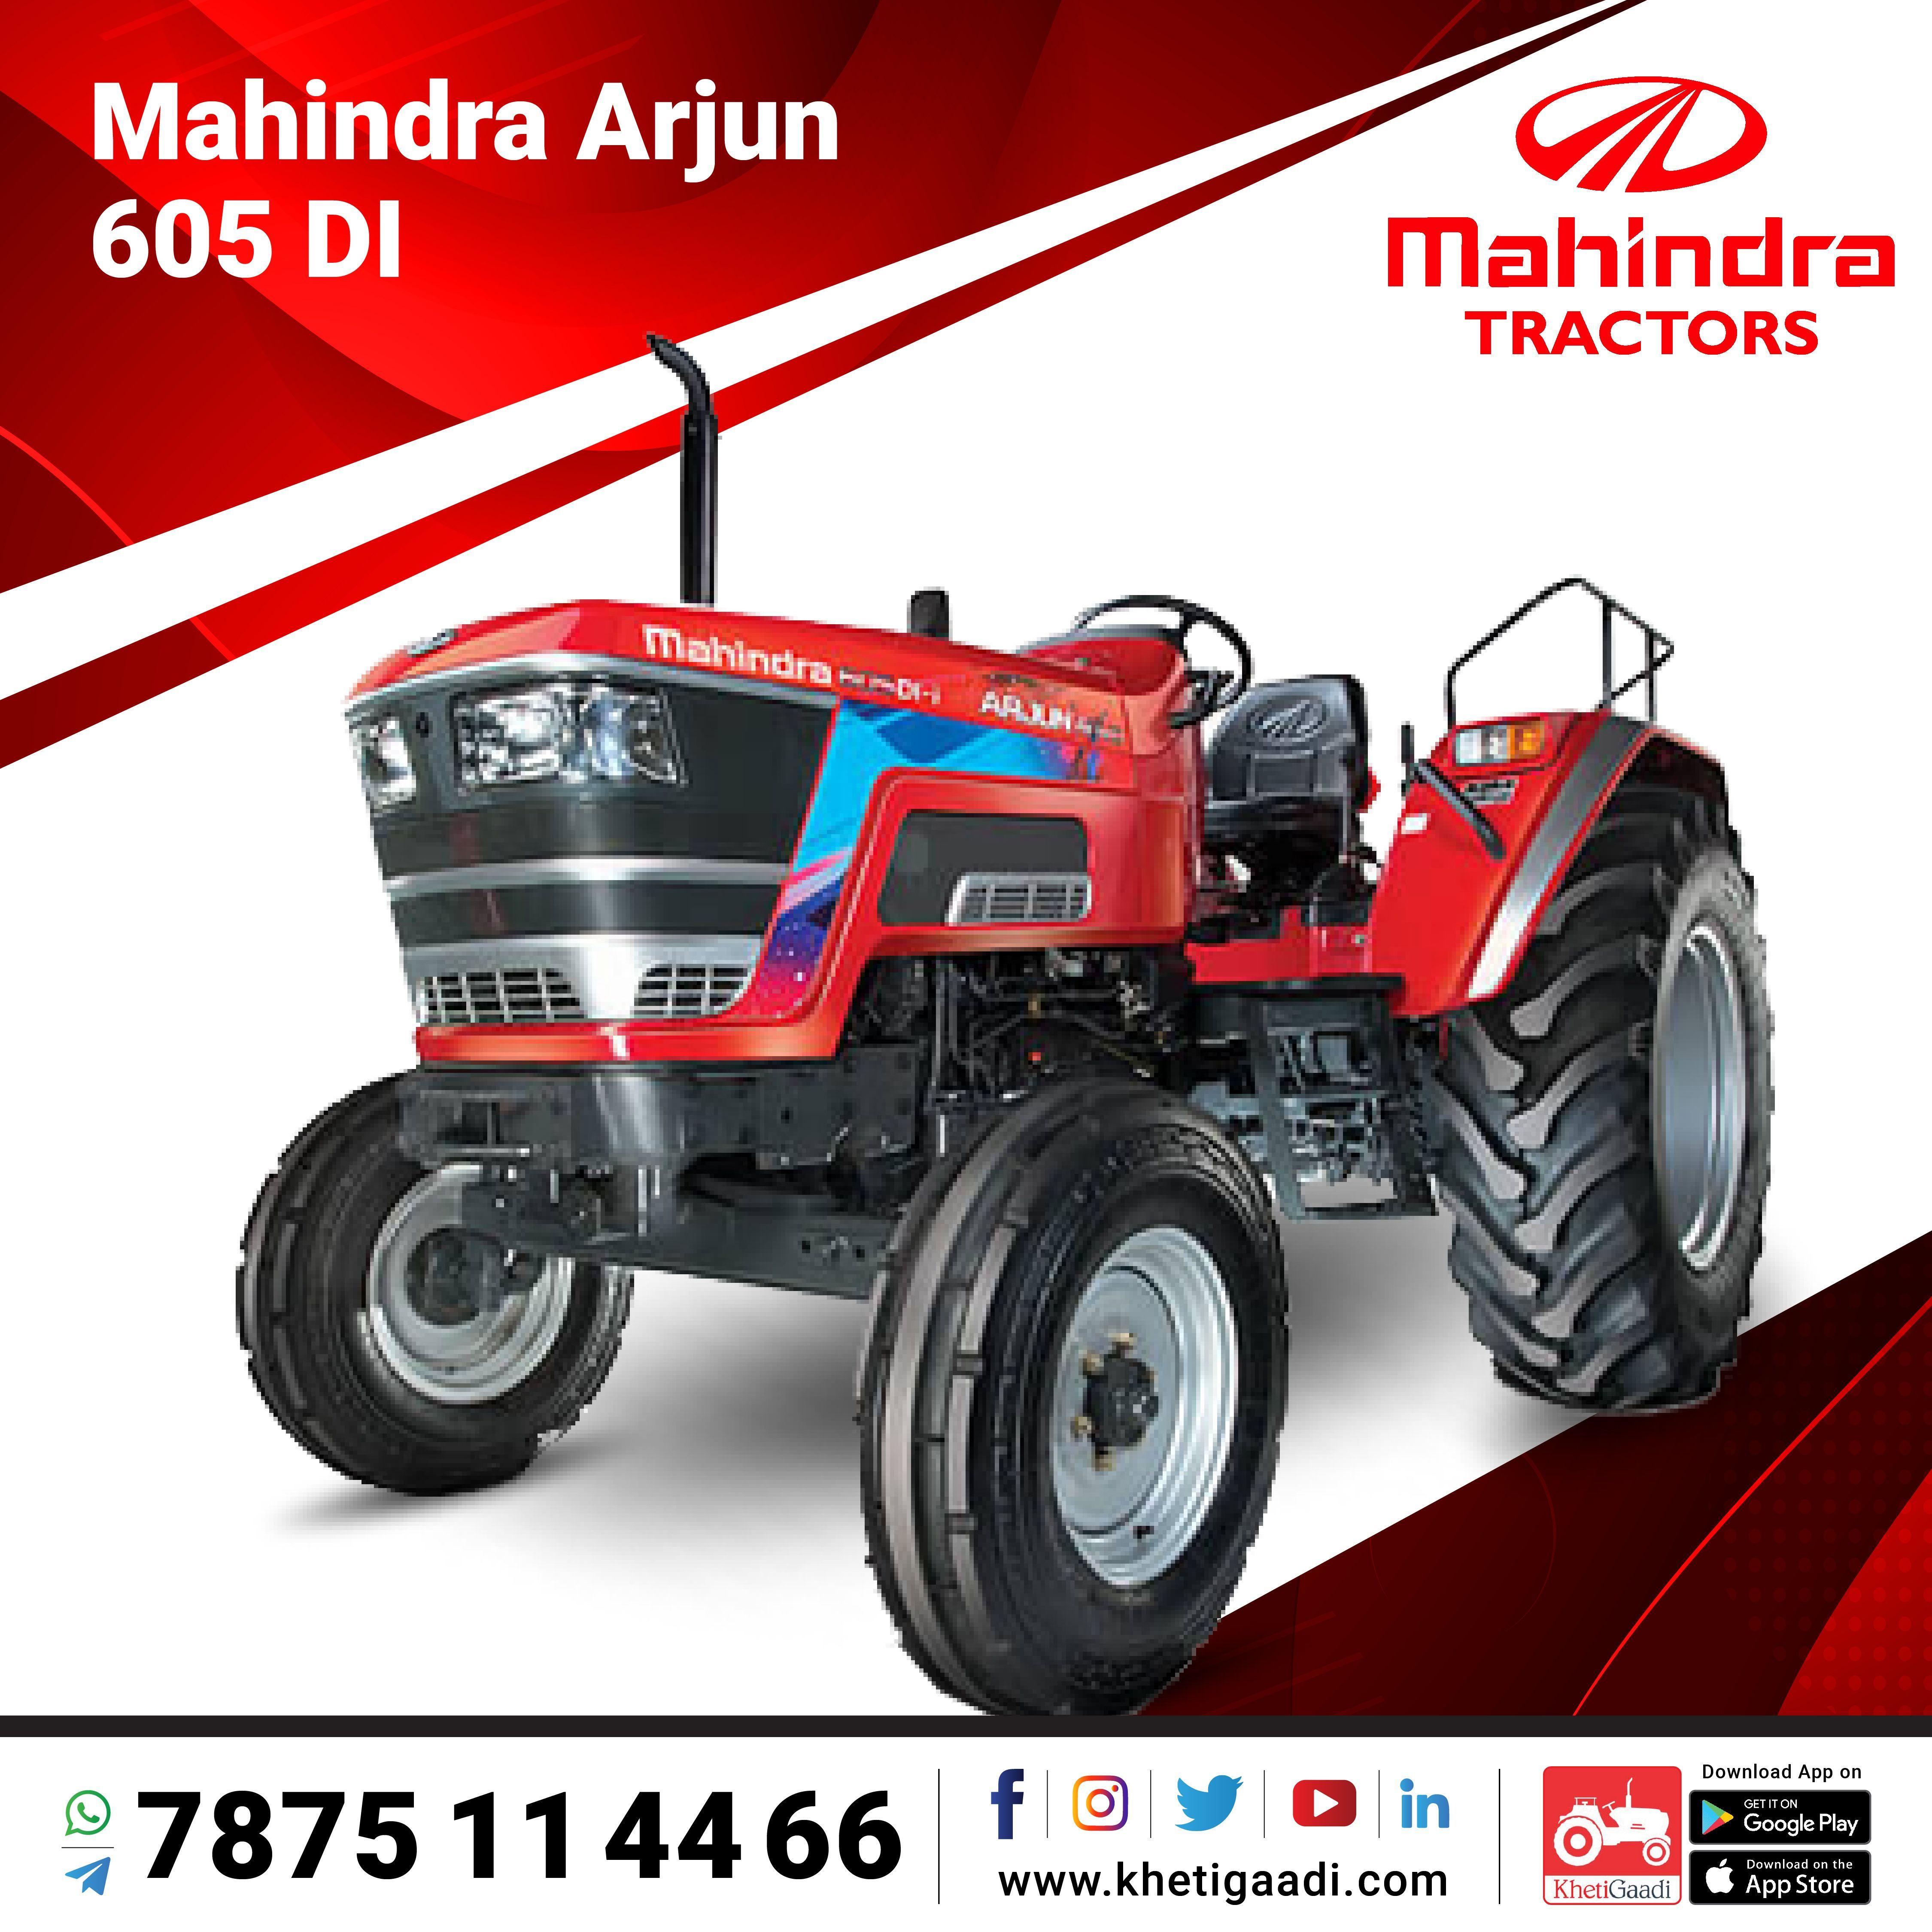 Mahindra Arjun 605 Di In 2021 Tractors Mahindra Tractor New Tractor